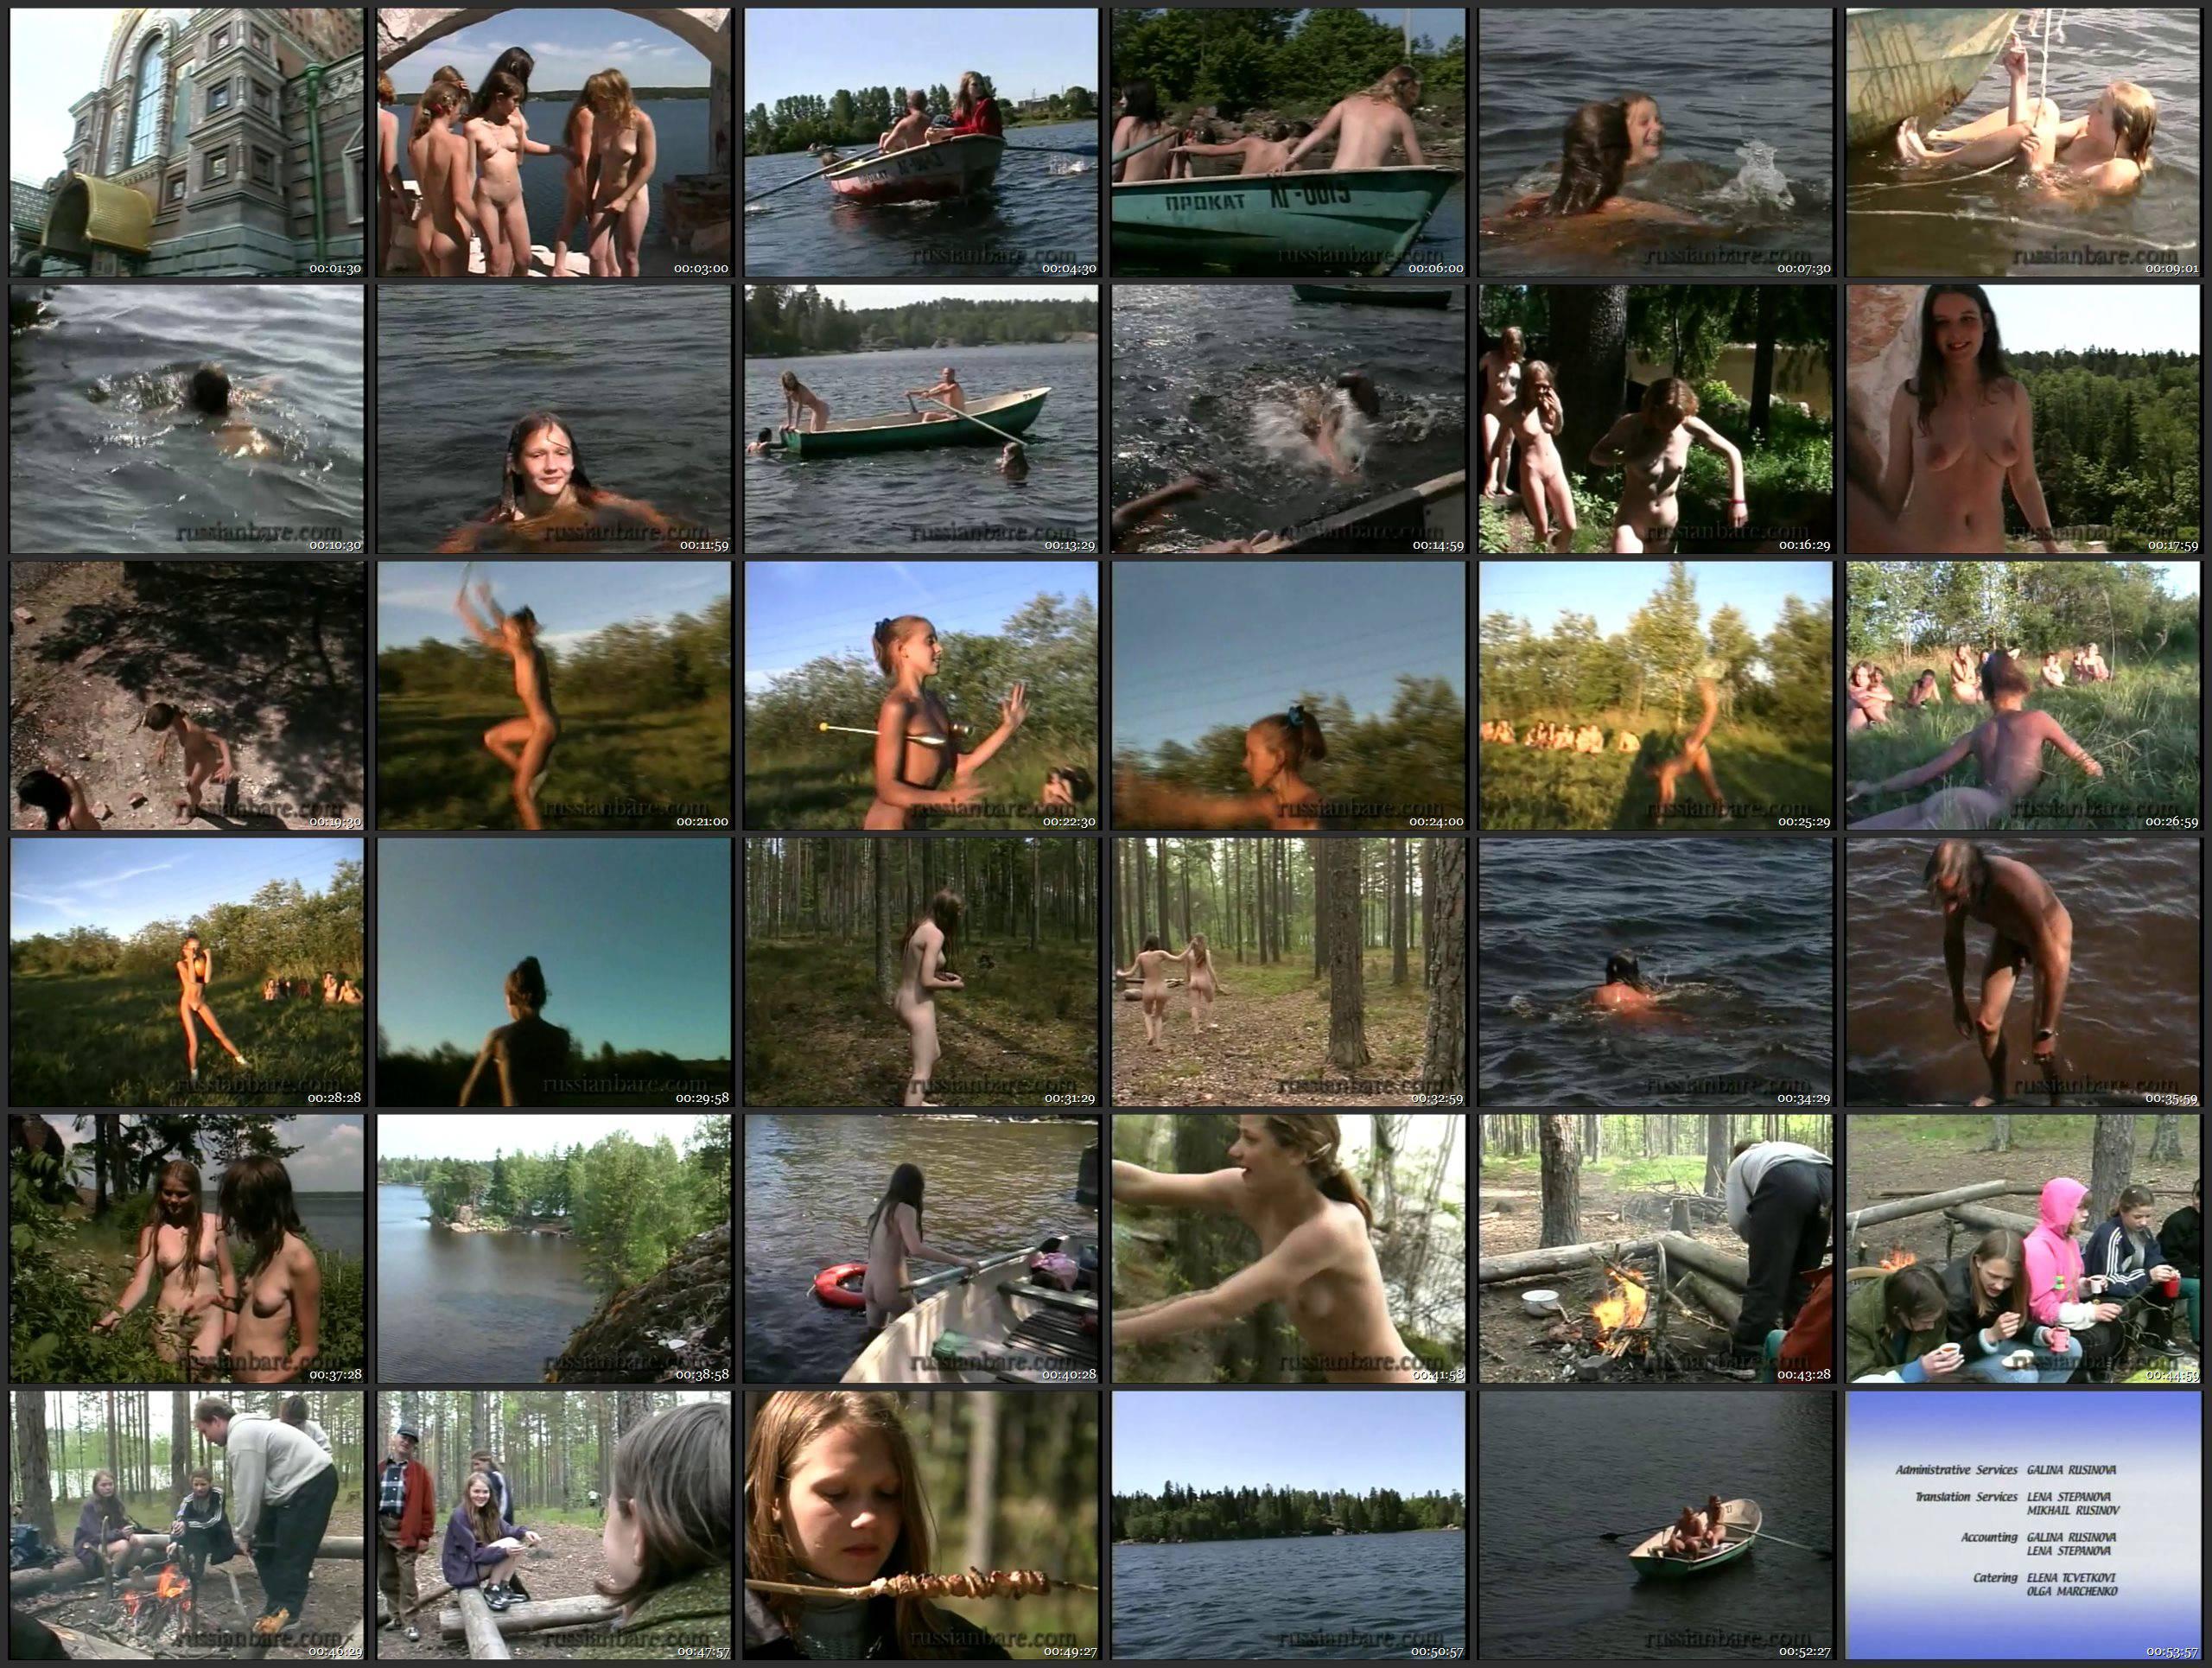 Enature Videos Castle Naturism - Naturism in Russia 2000 Series - Thumbnails